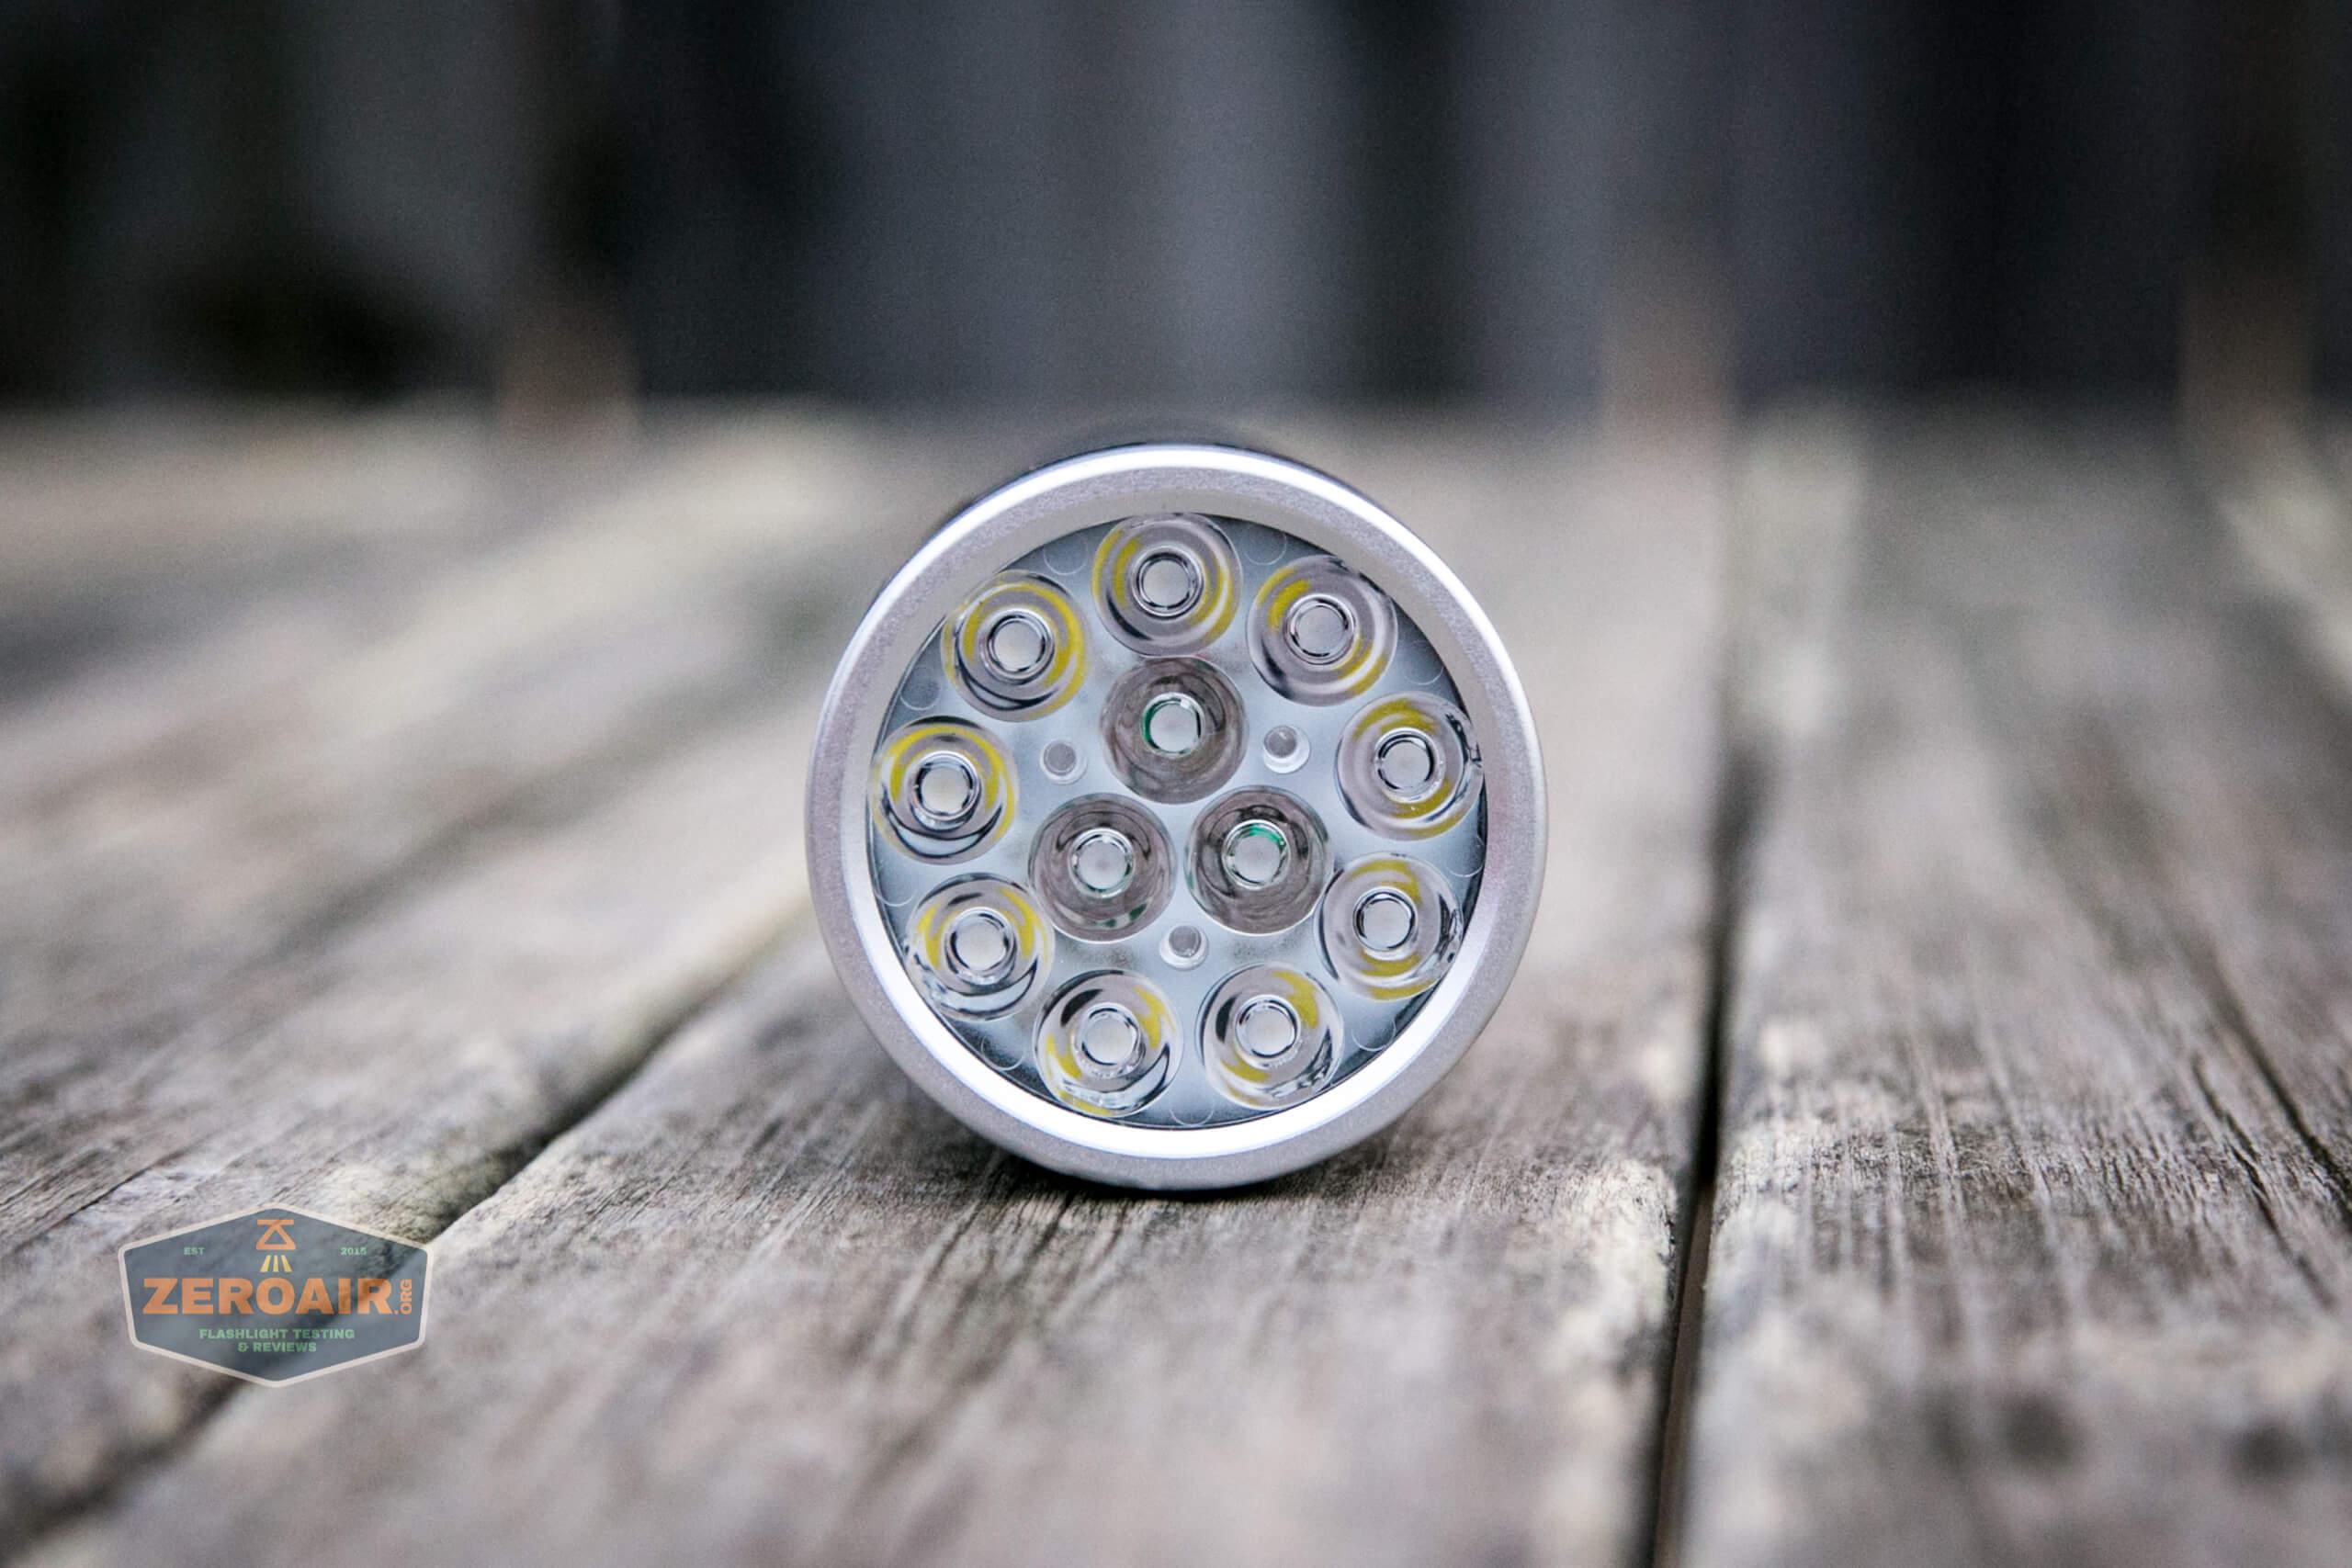 nitebeam x12uv flashlight emitters